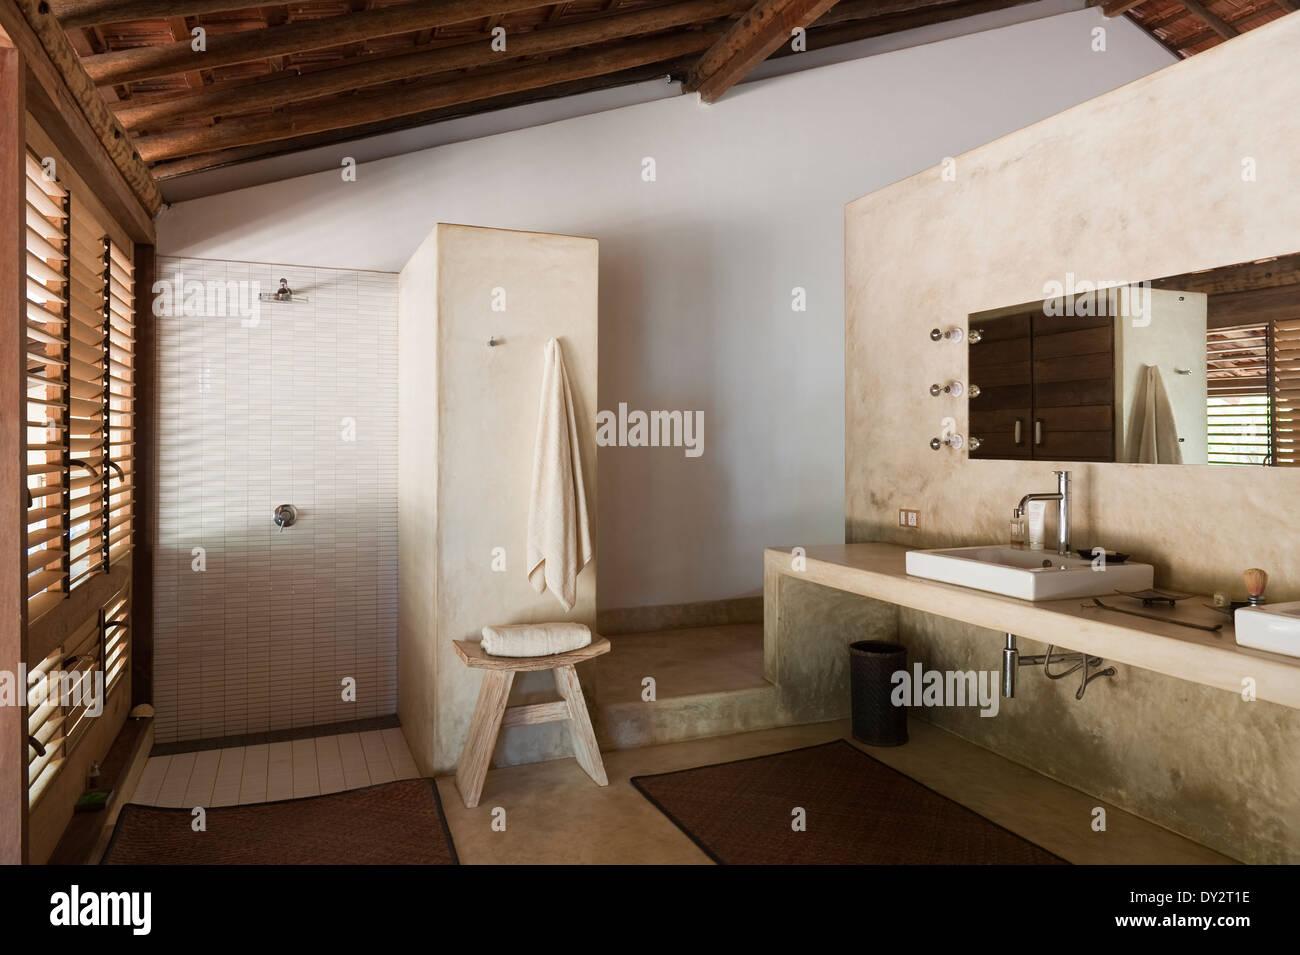 Bathroom interior of Goan beach house, India - Stock Image